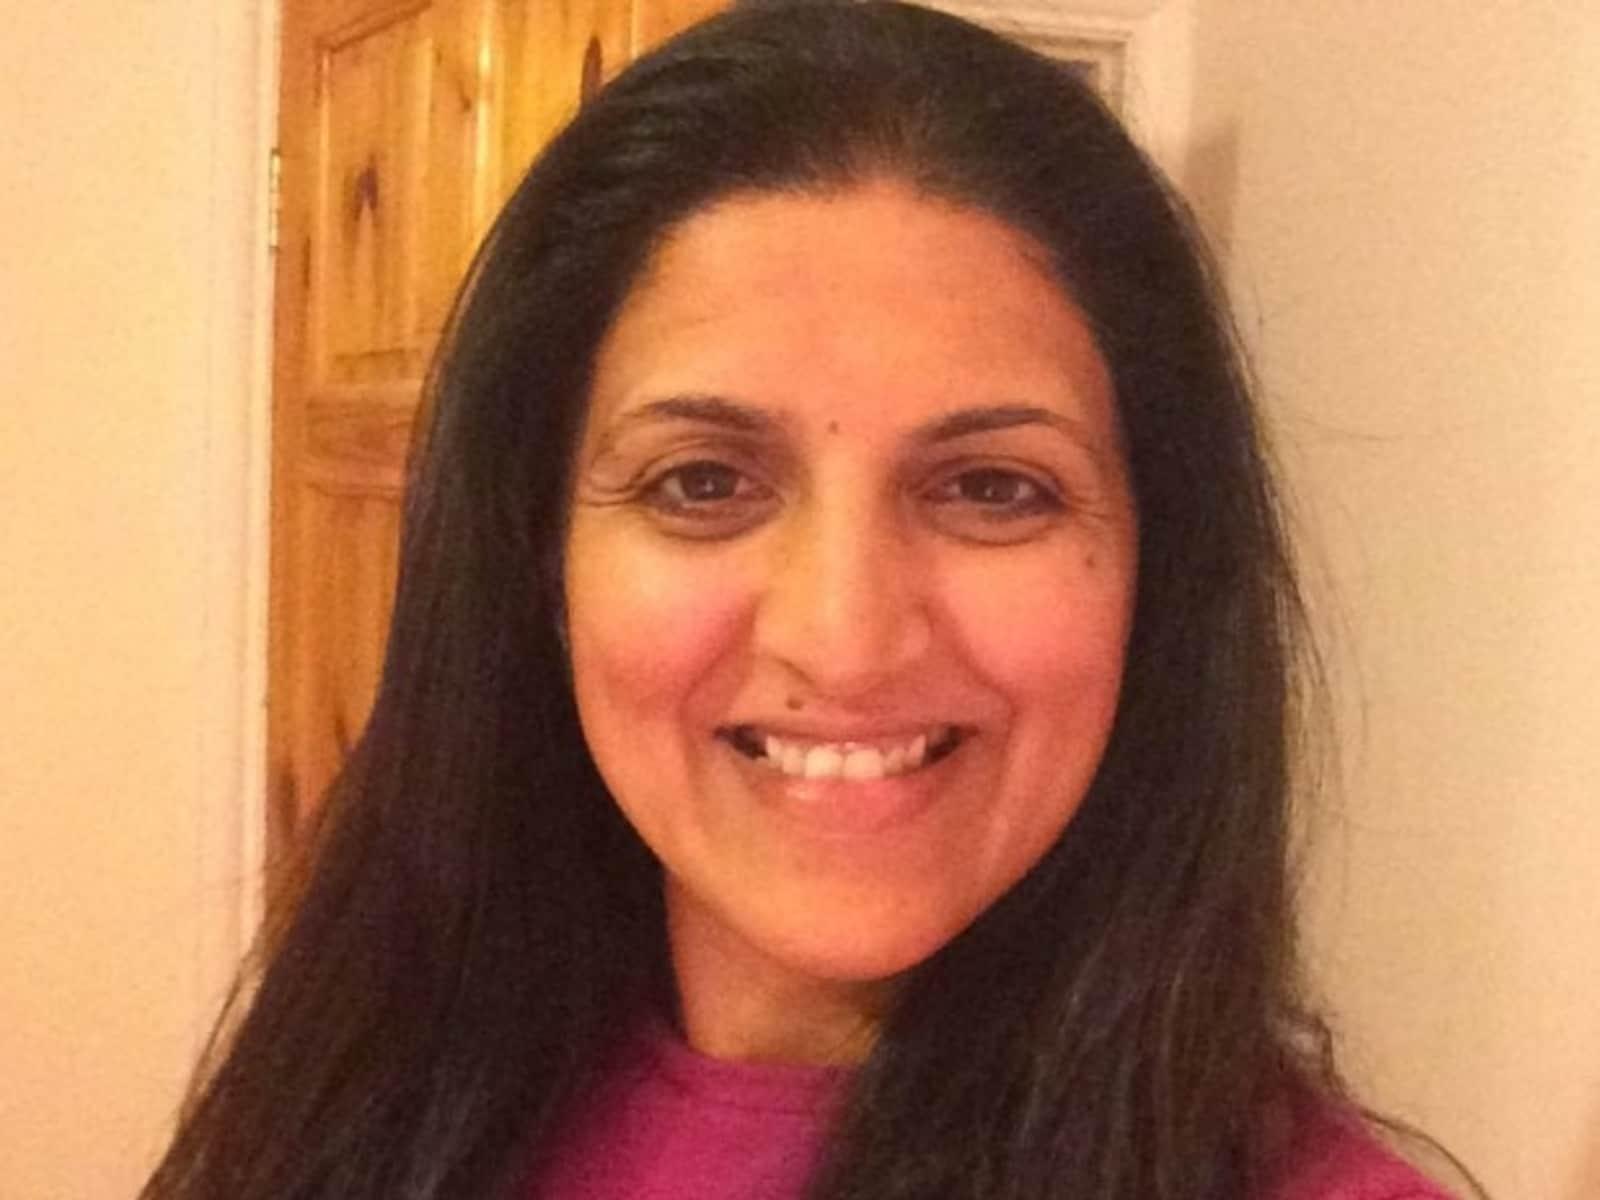 Narinder from Birmingham, United Kingdom